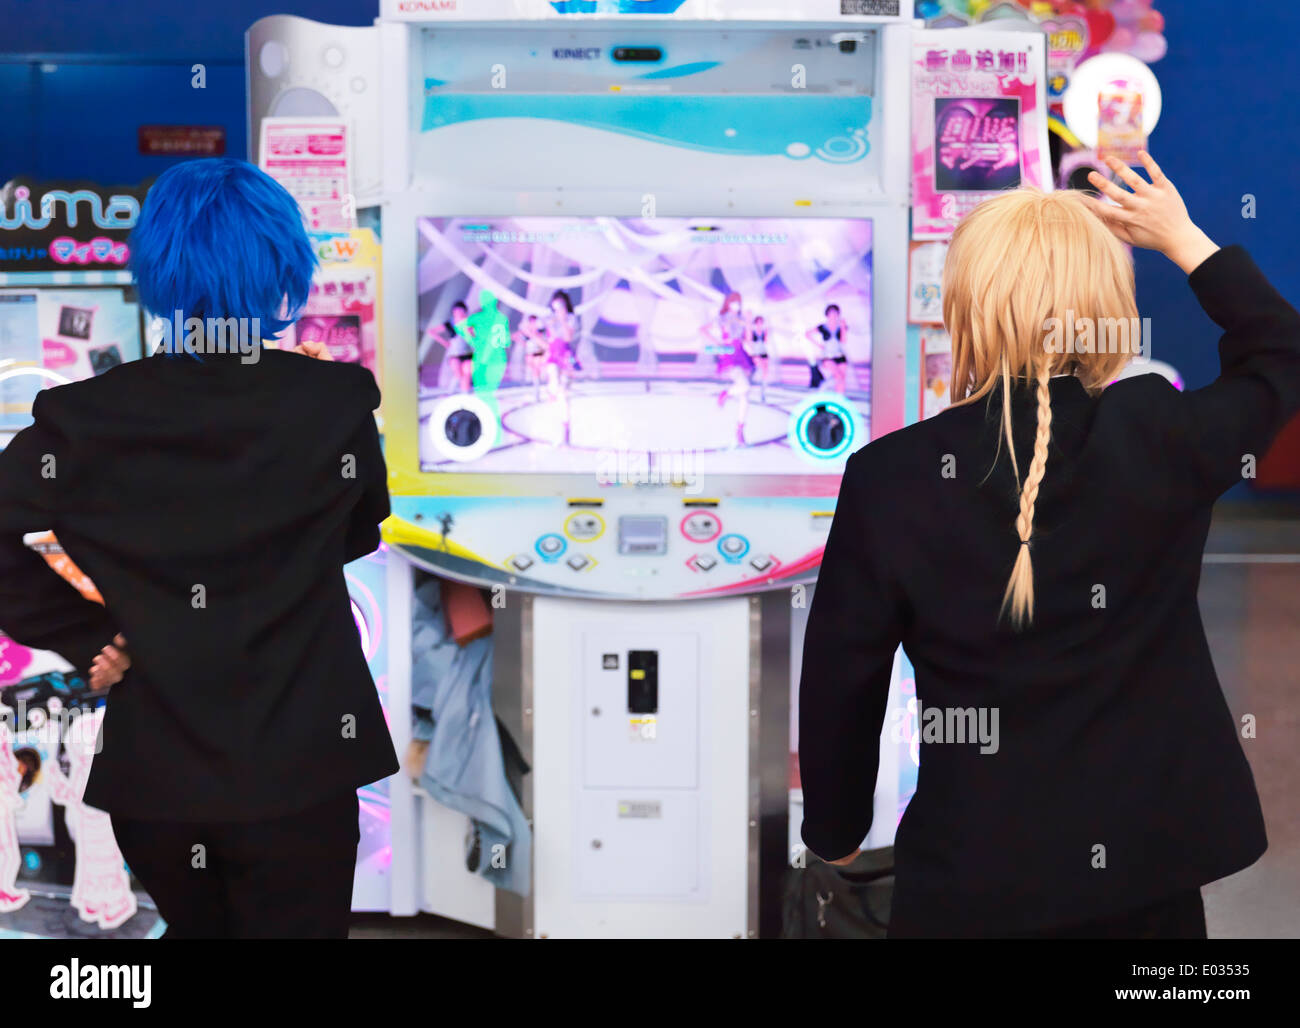 Girls playing dance station slot machine at arcade in Odaiba, Tokyo, Japan - Stock Image